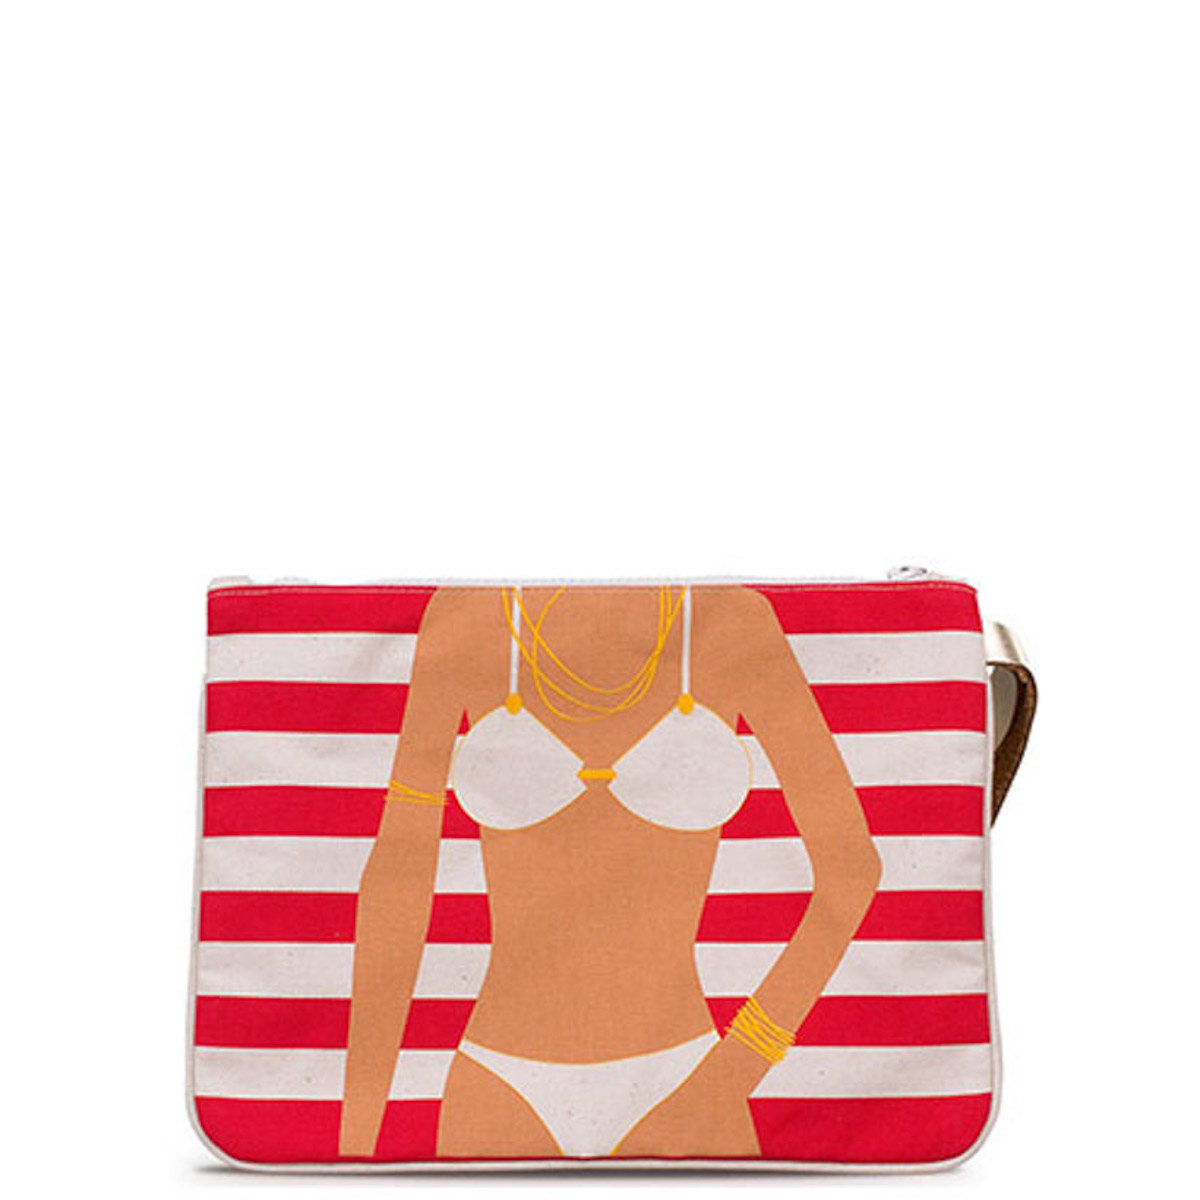 Clucth γυναικεία A to Z Greek Bikini CLUTCH - Έως 3 Άτοκες Δόσεις άνω των 60€